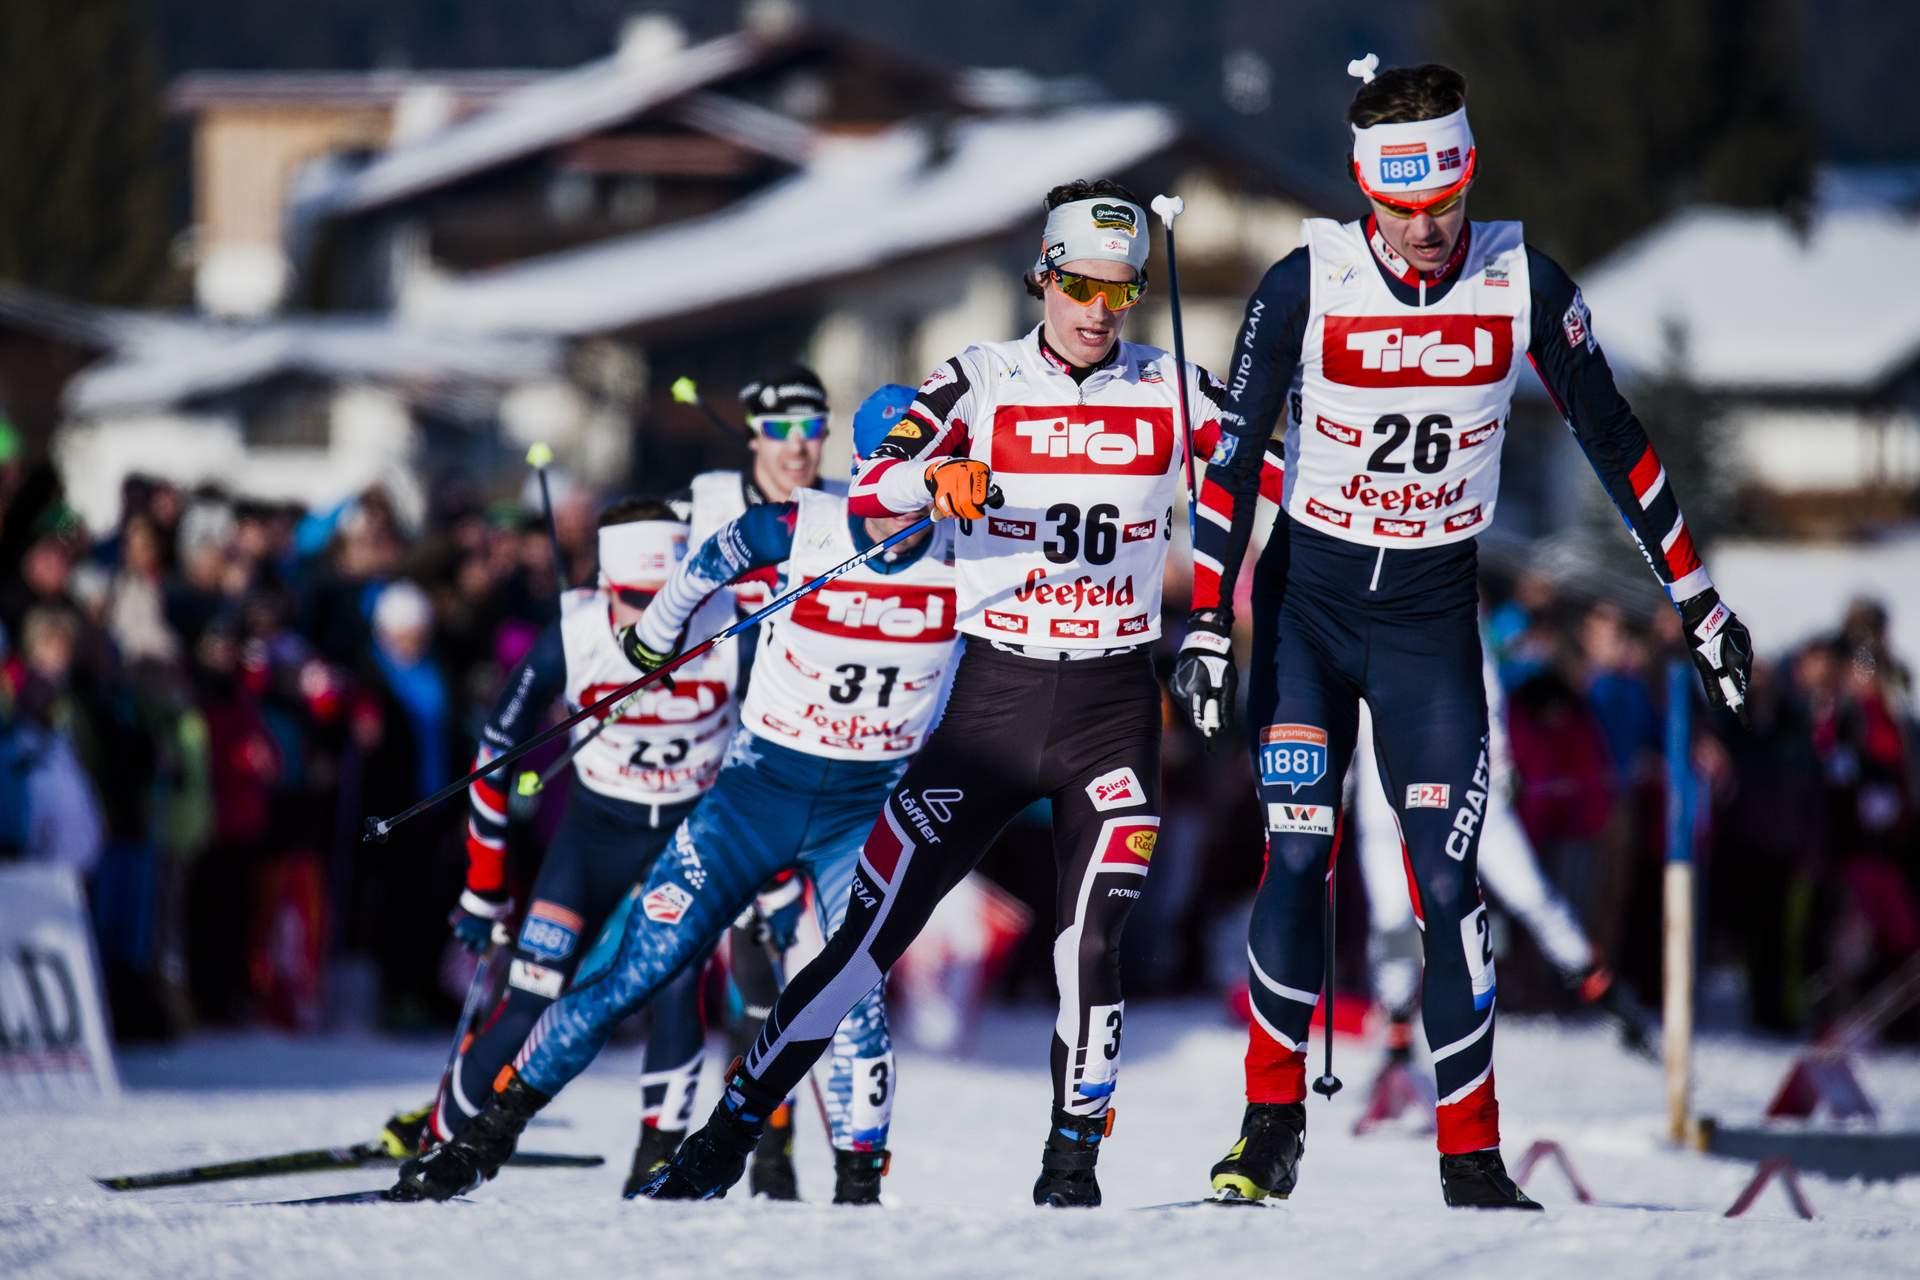 Seefeld: Nordische SKI-WM